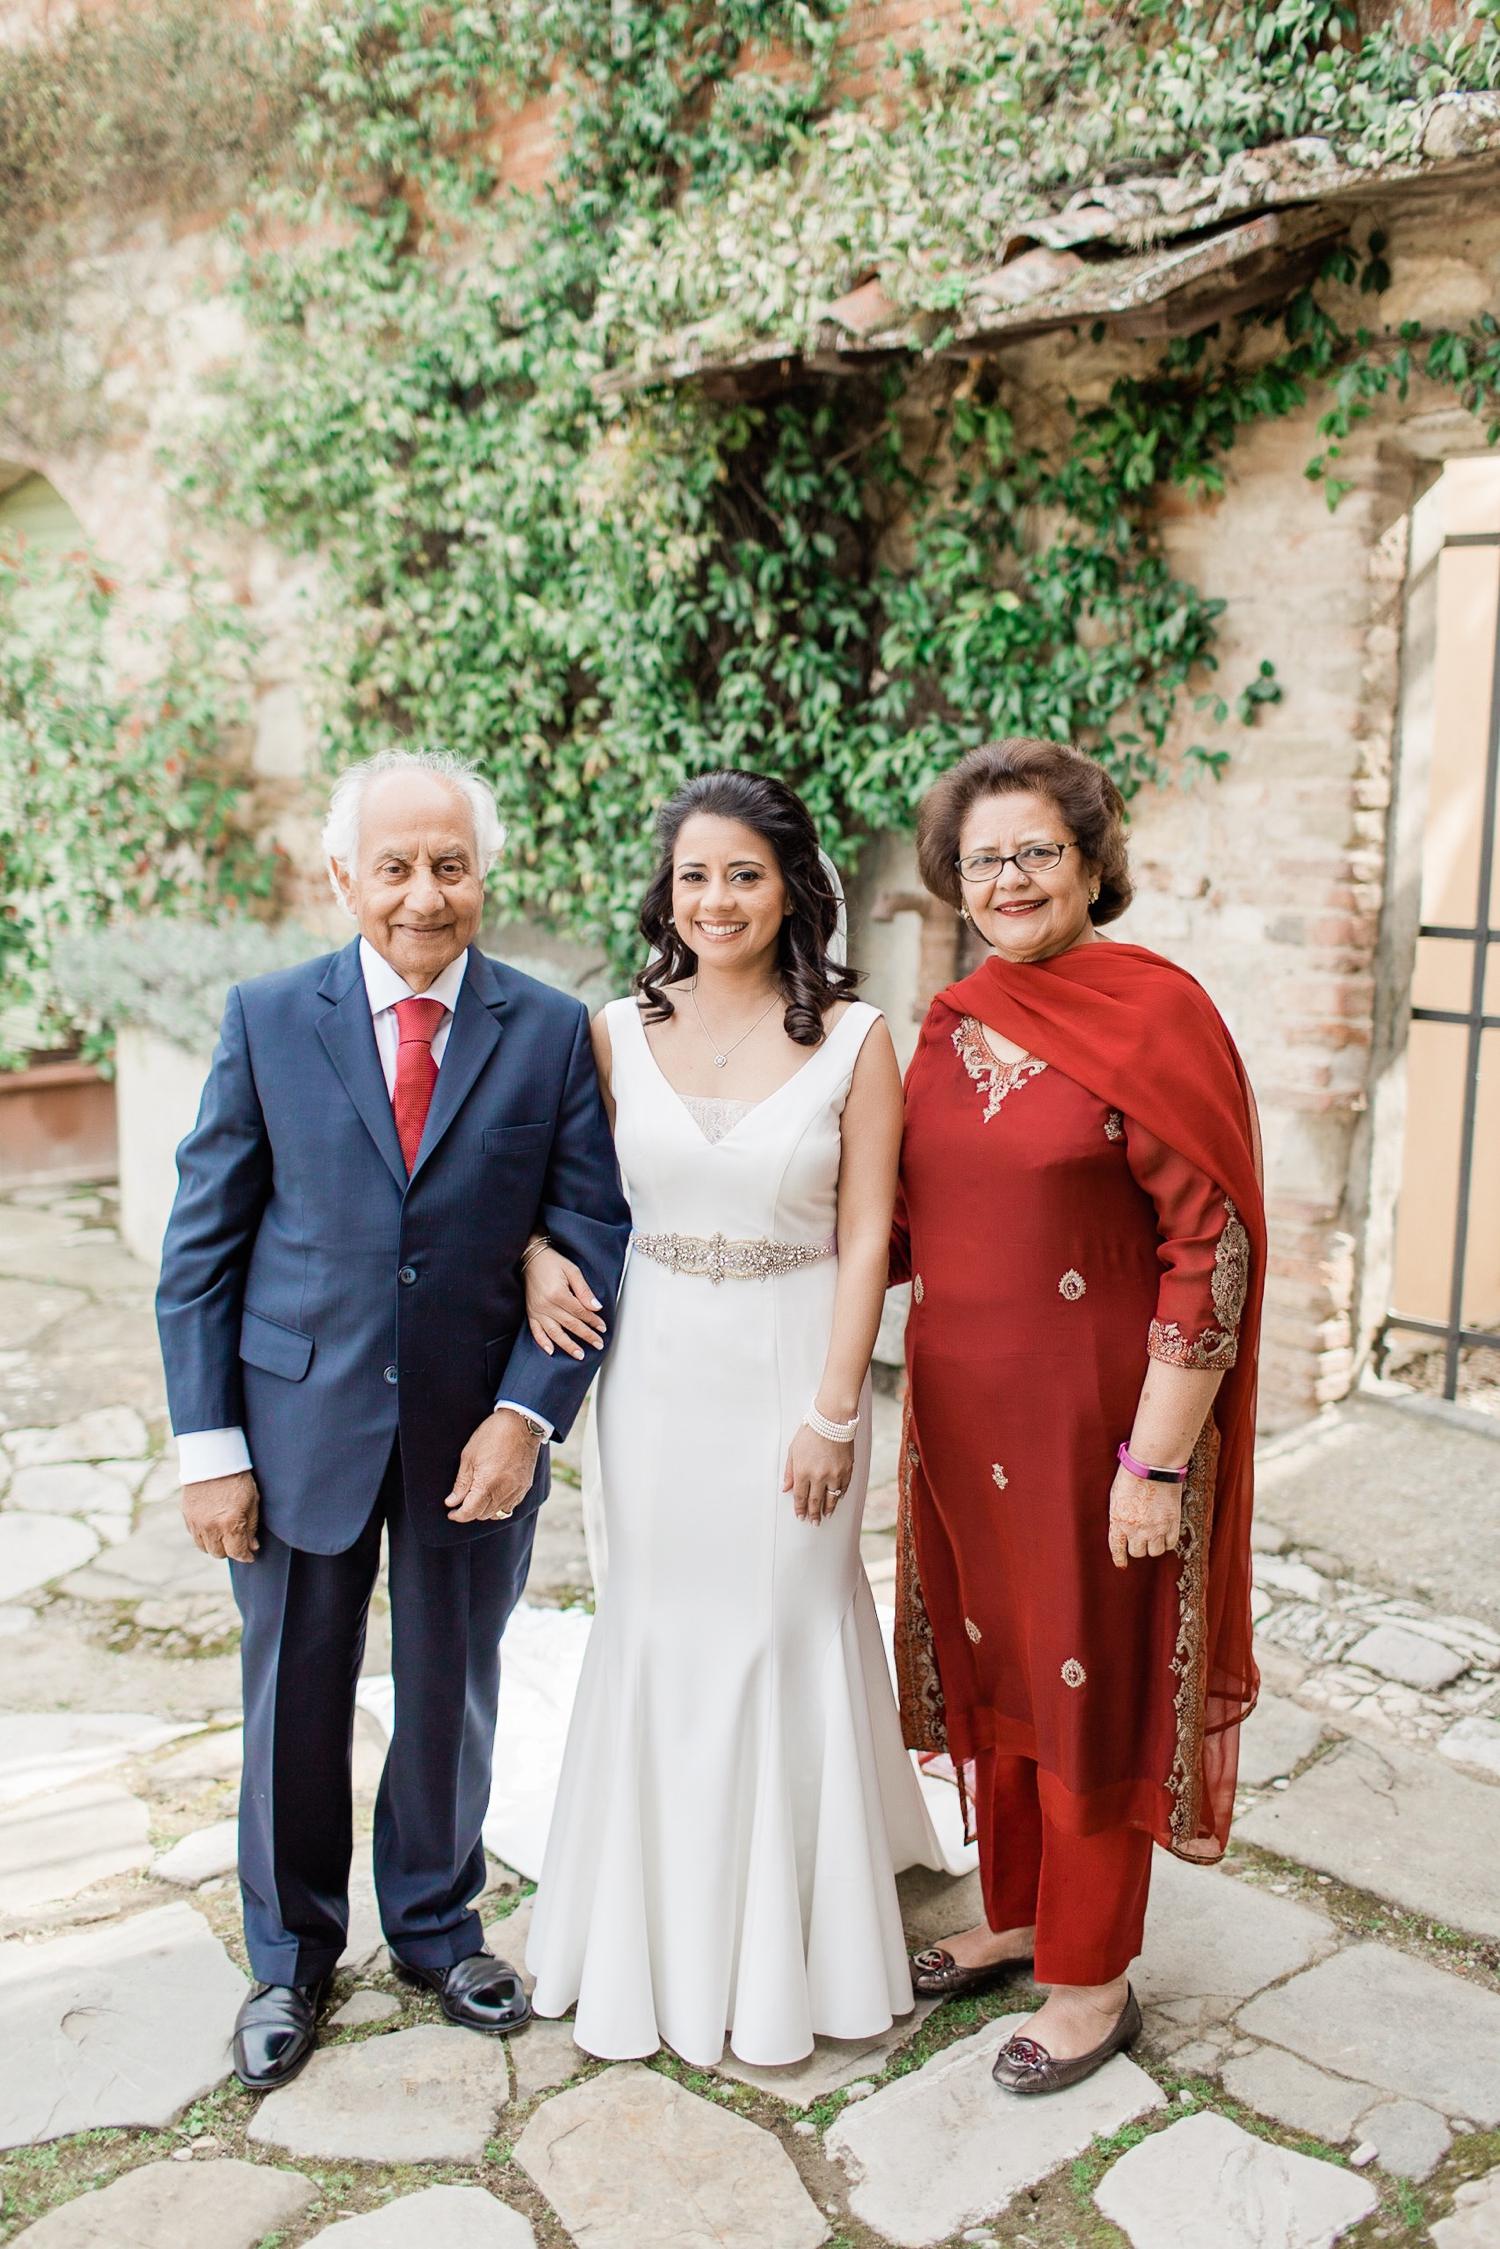 fine-art-film-florence-italy-wedding-photographer-villa-medicea-di-lilliano_3184.jpg